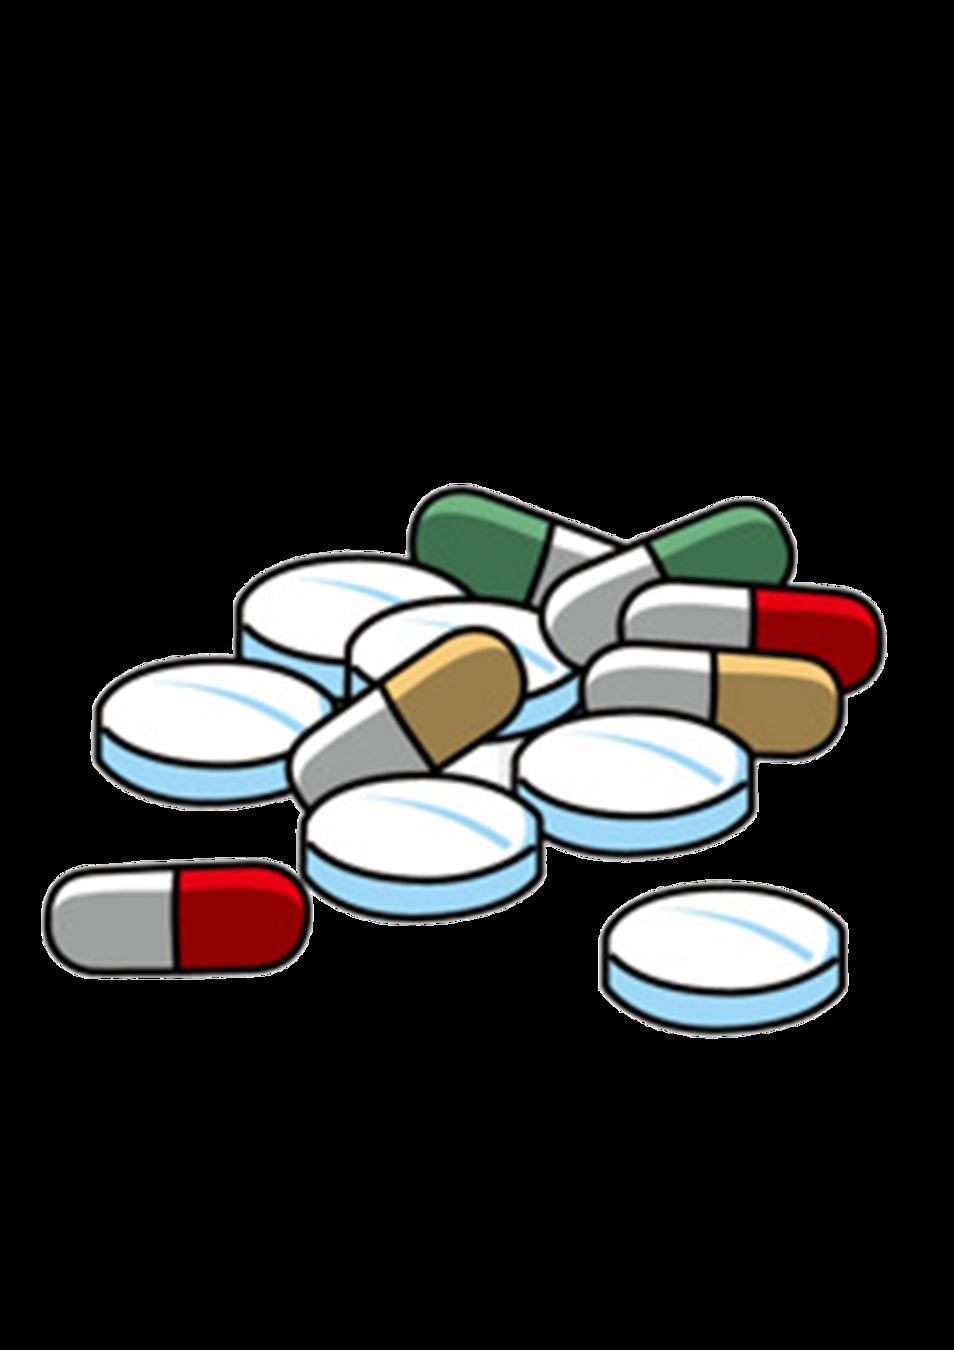 Drug clipart analgesic. Copy of